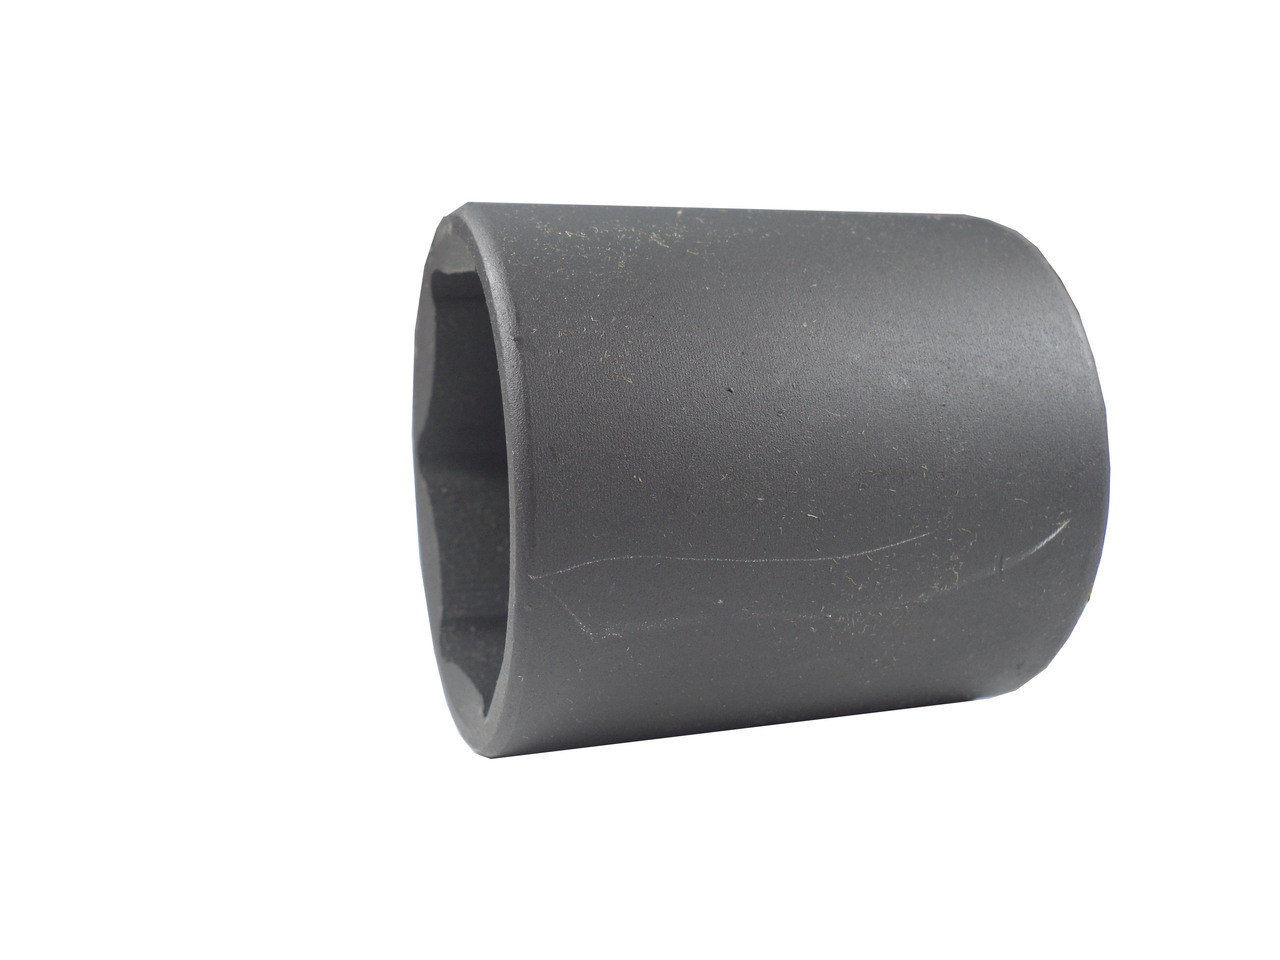 DODGE 43mm FRONT AXLE SHAFT HUB NUT SOCKET QT1008i